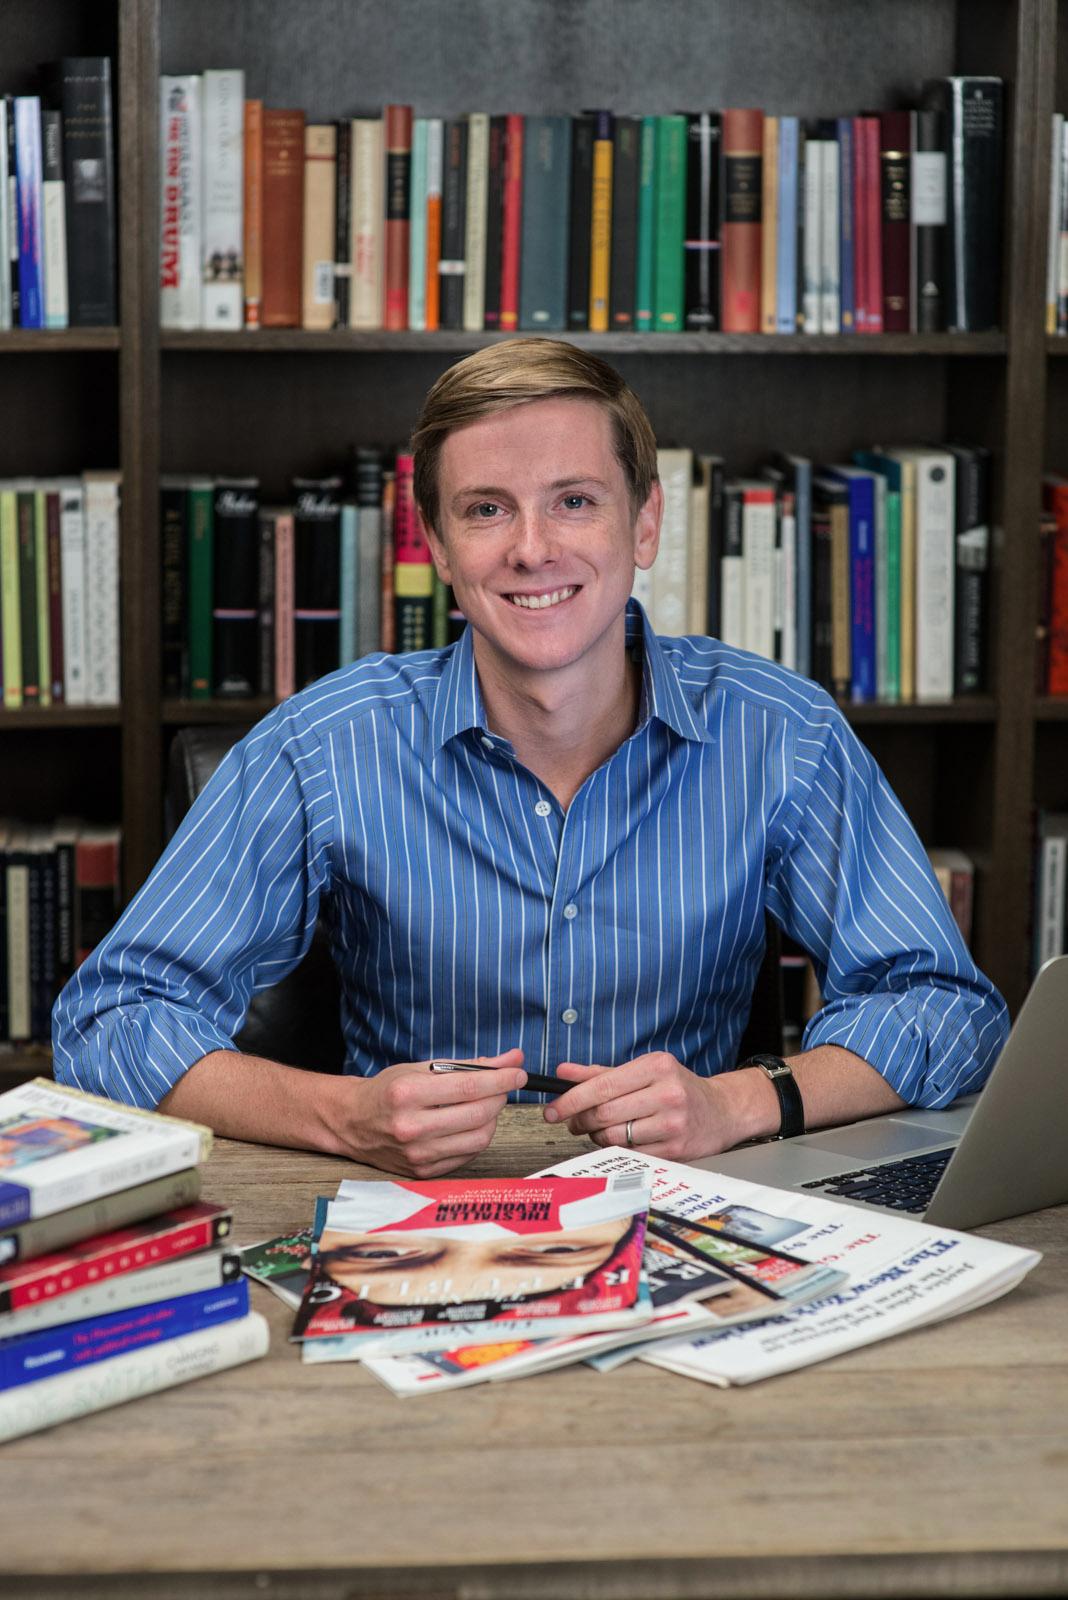 Chris Hughes, co-founder of Facebook